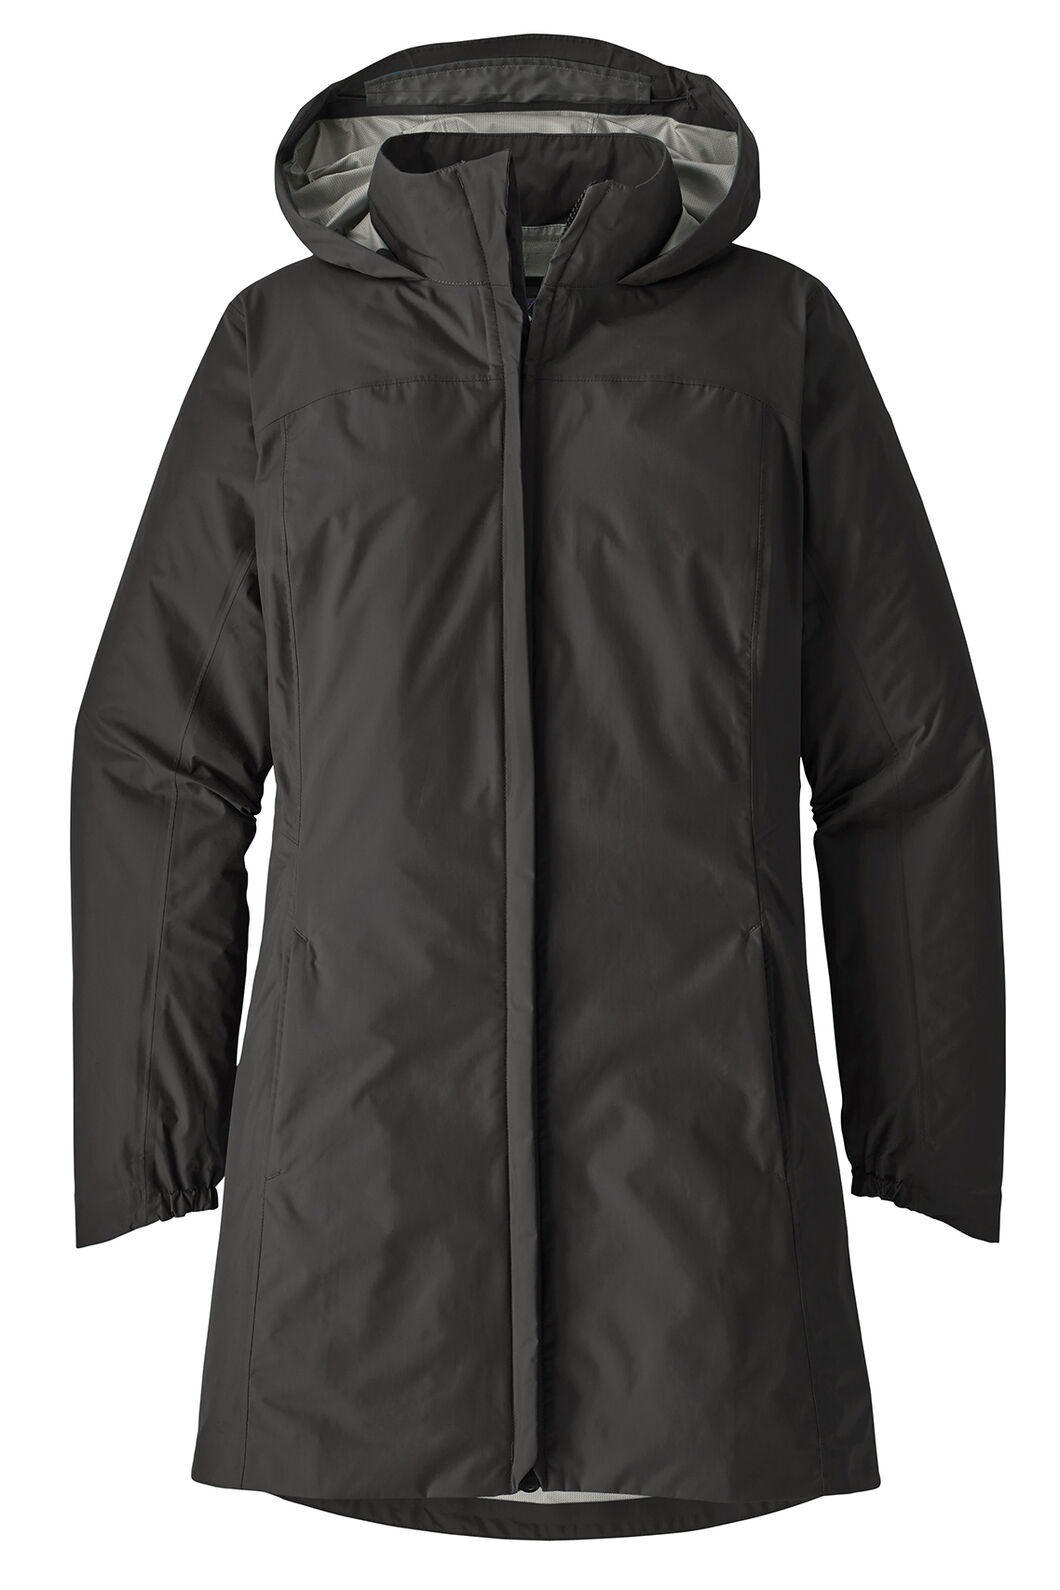 Patagonia W's Torrentshell City Coat Jacket, Black, hi-res